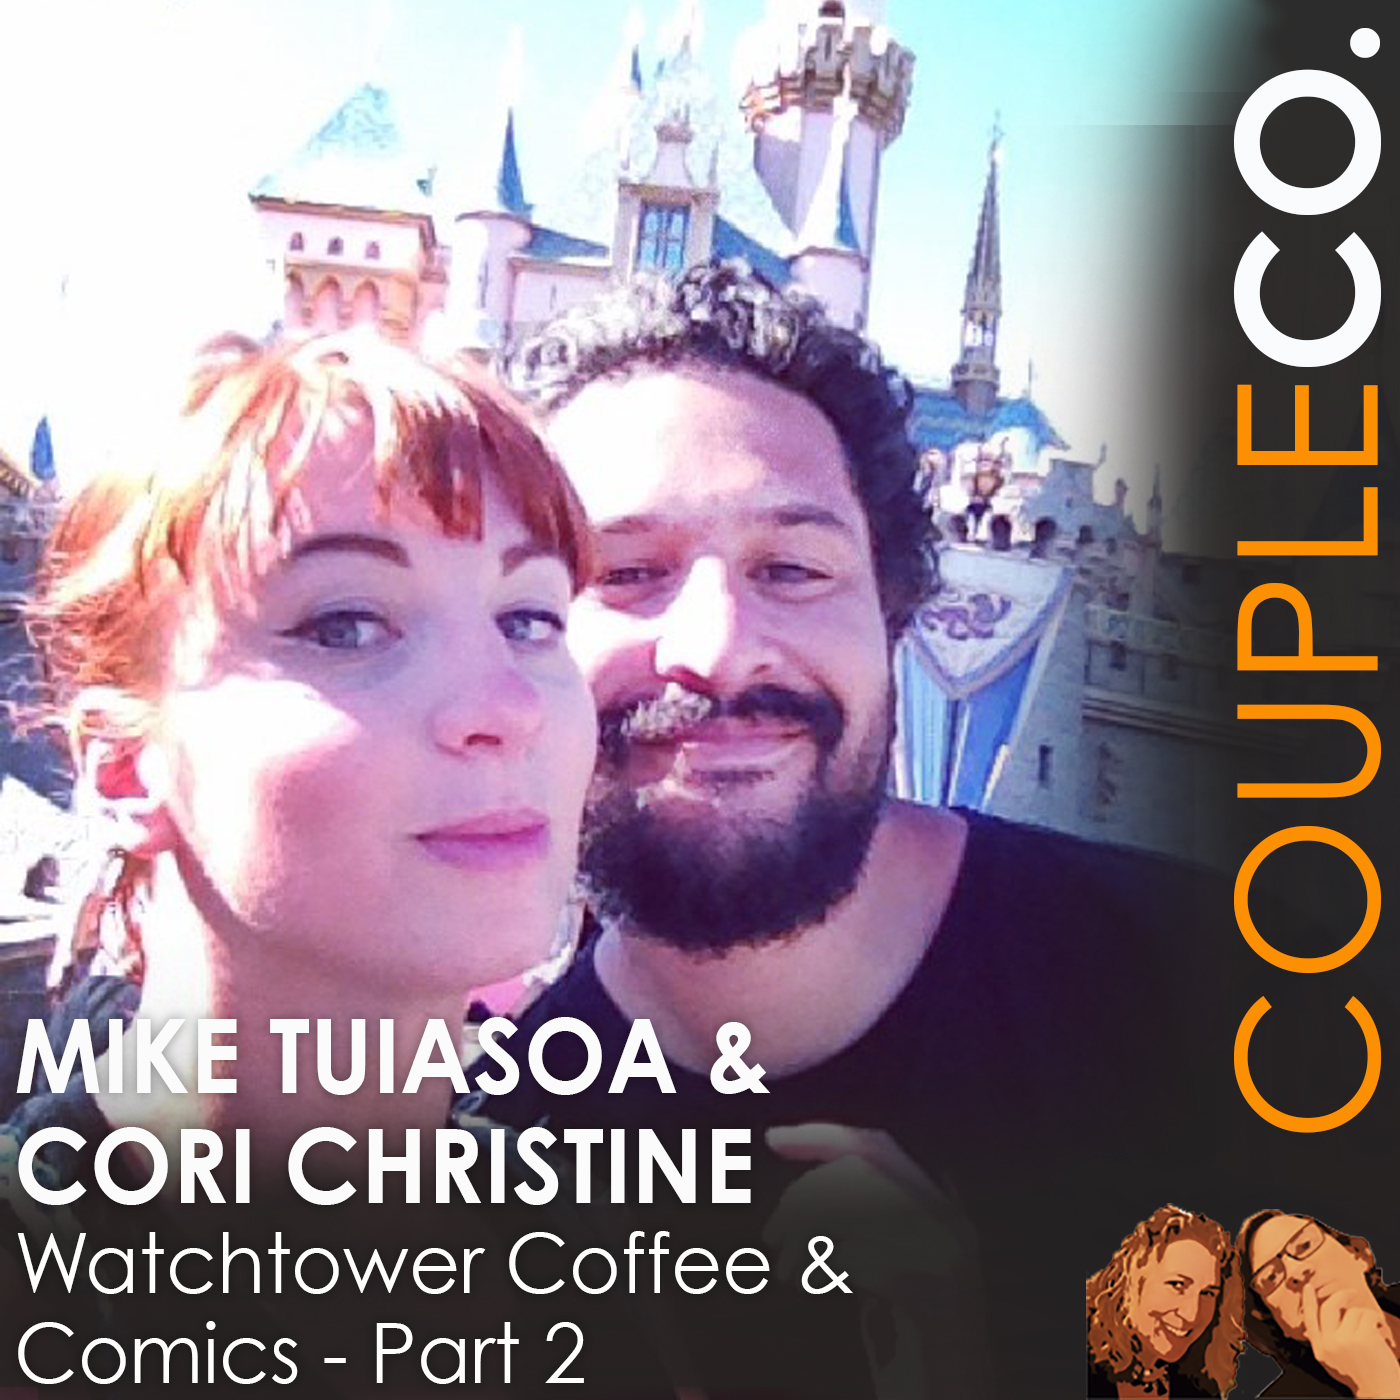 The Joker, Jedi And Java: Mike Tuiasoa And Cori Christine of Watchtower Comics And Coffee, Salt Lake City, Part 2